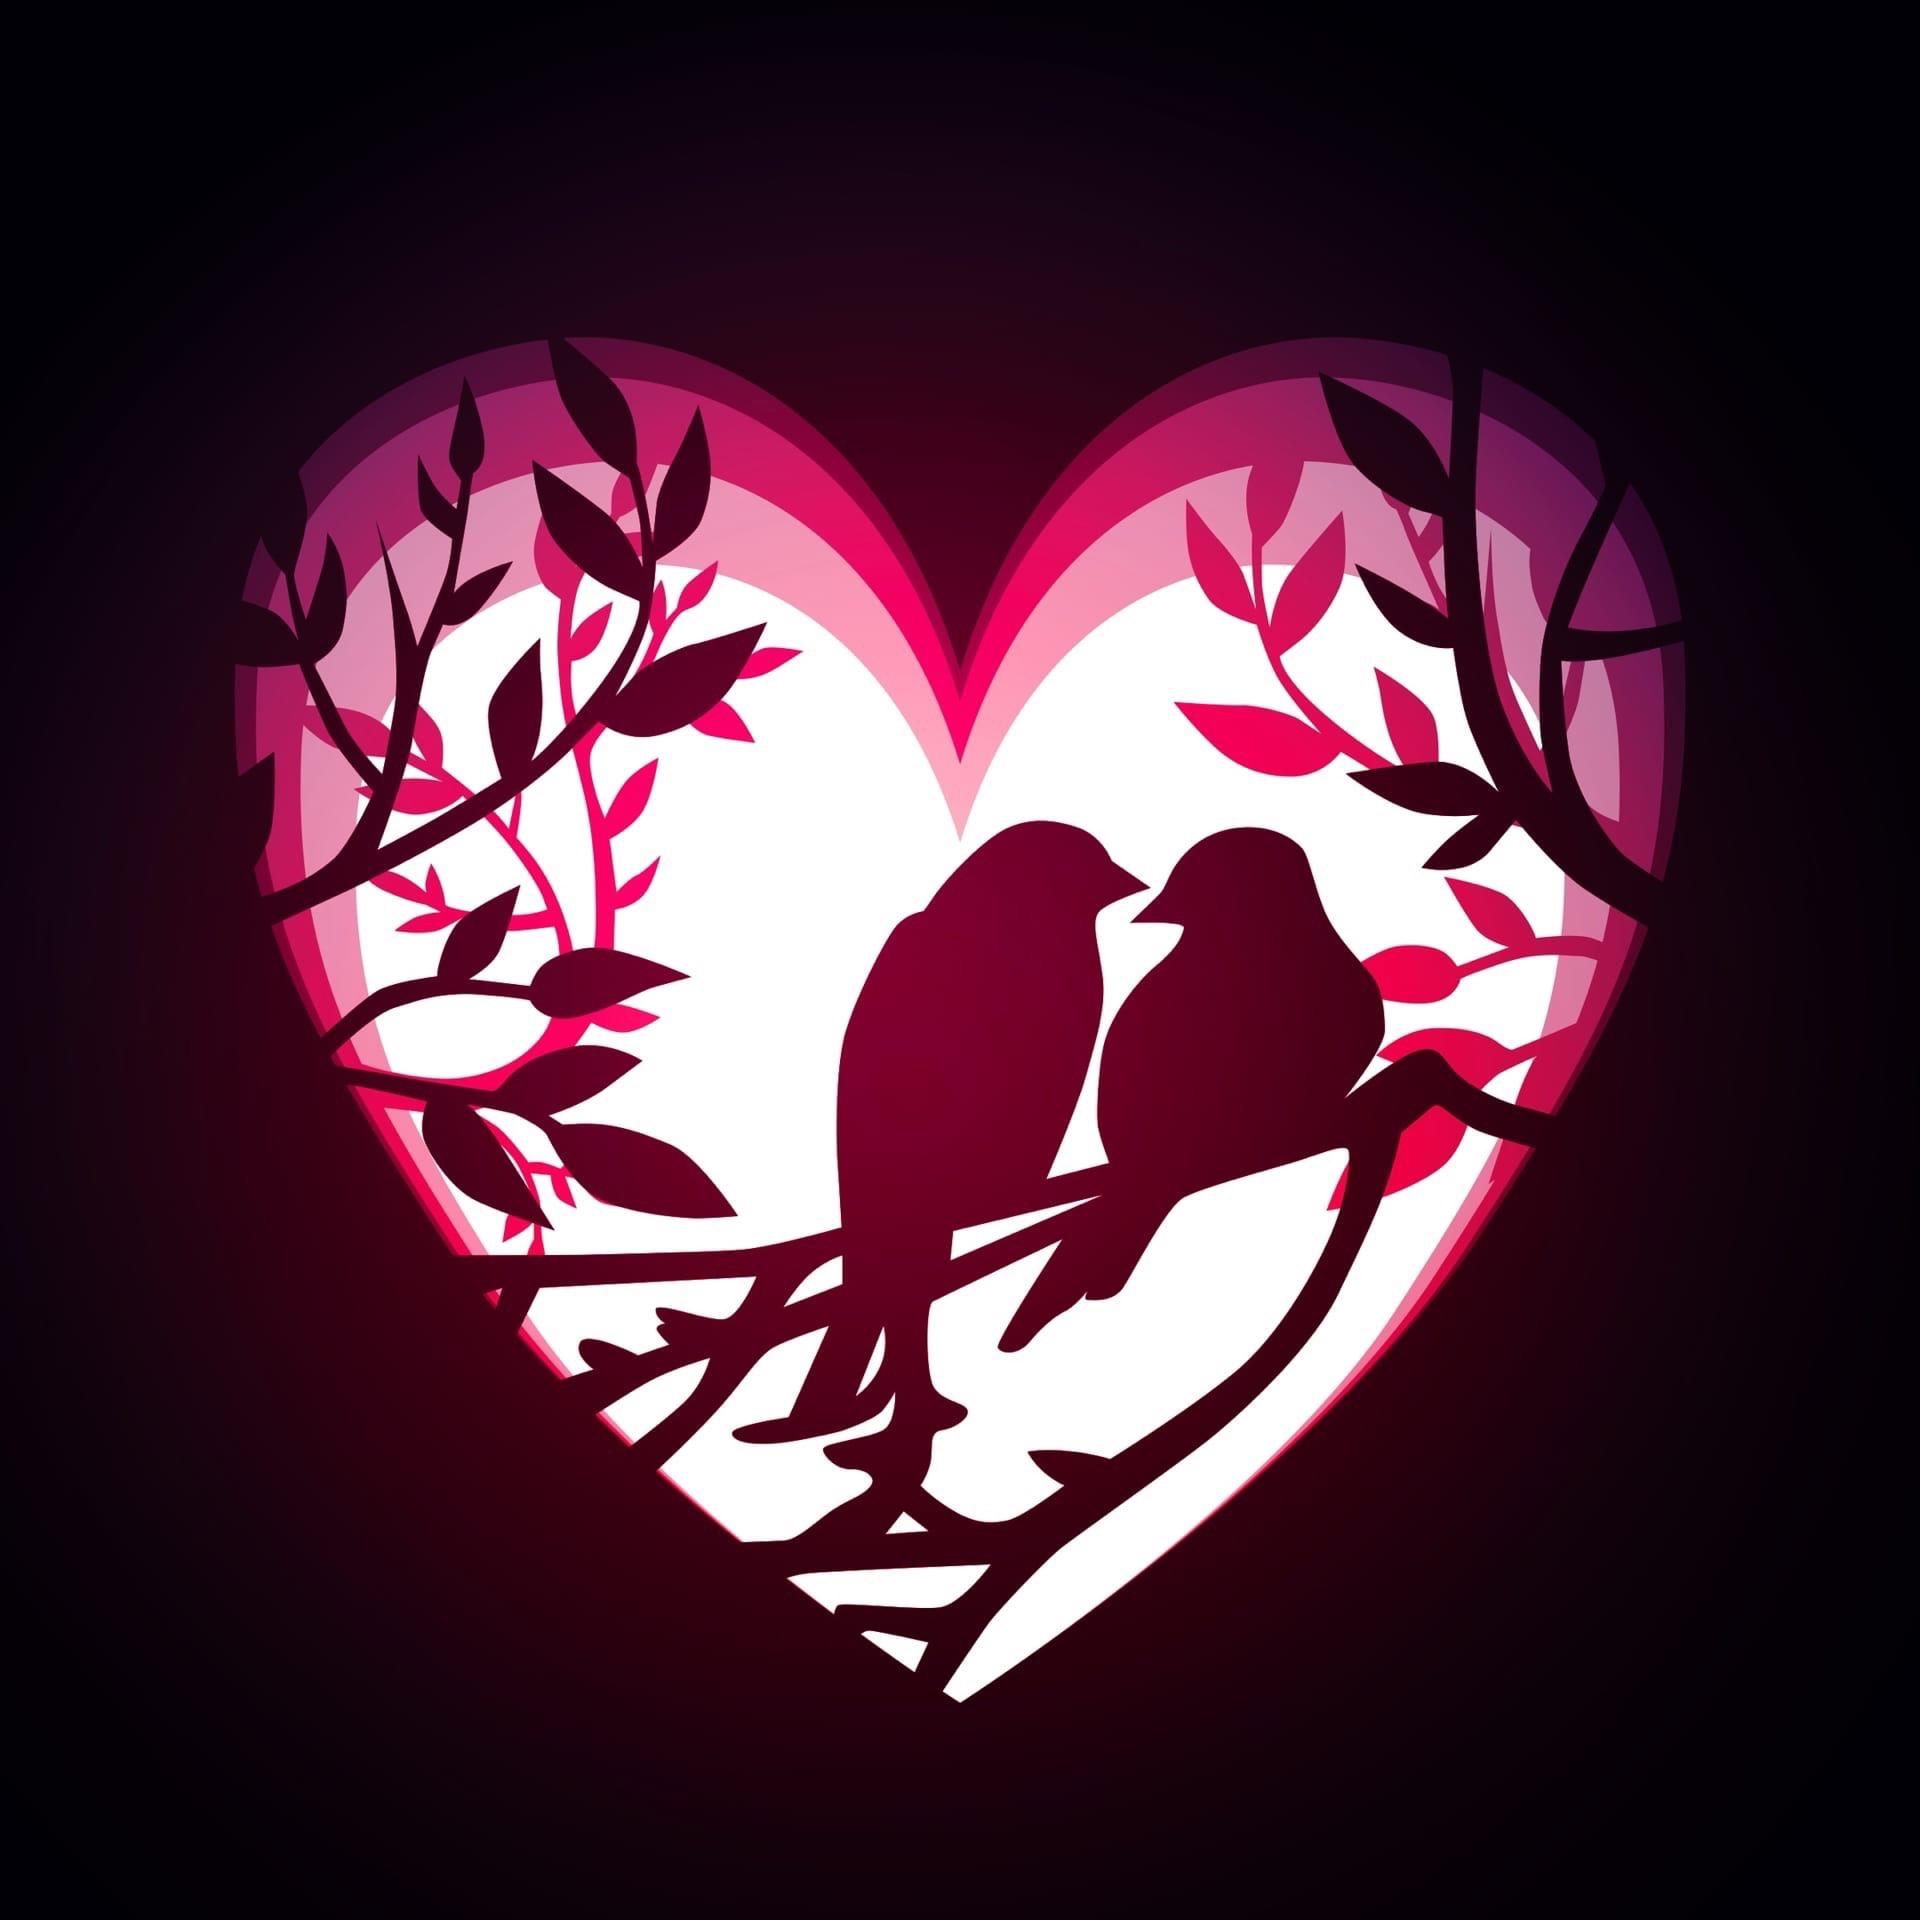 Laser Cut Love Birds Layered Decor DXF File